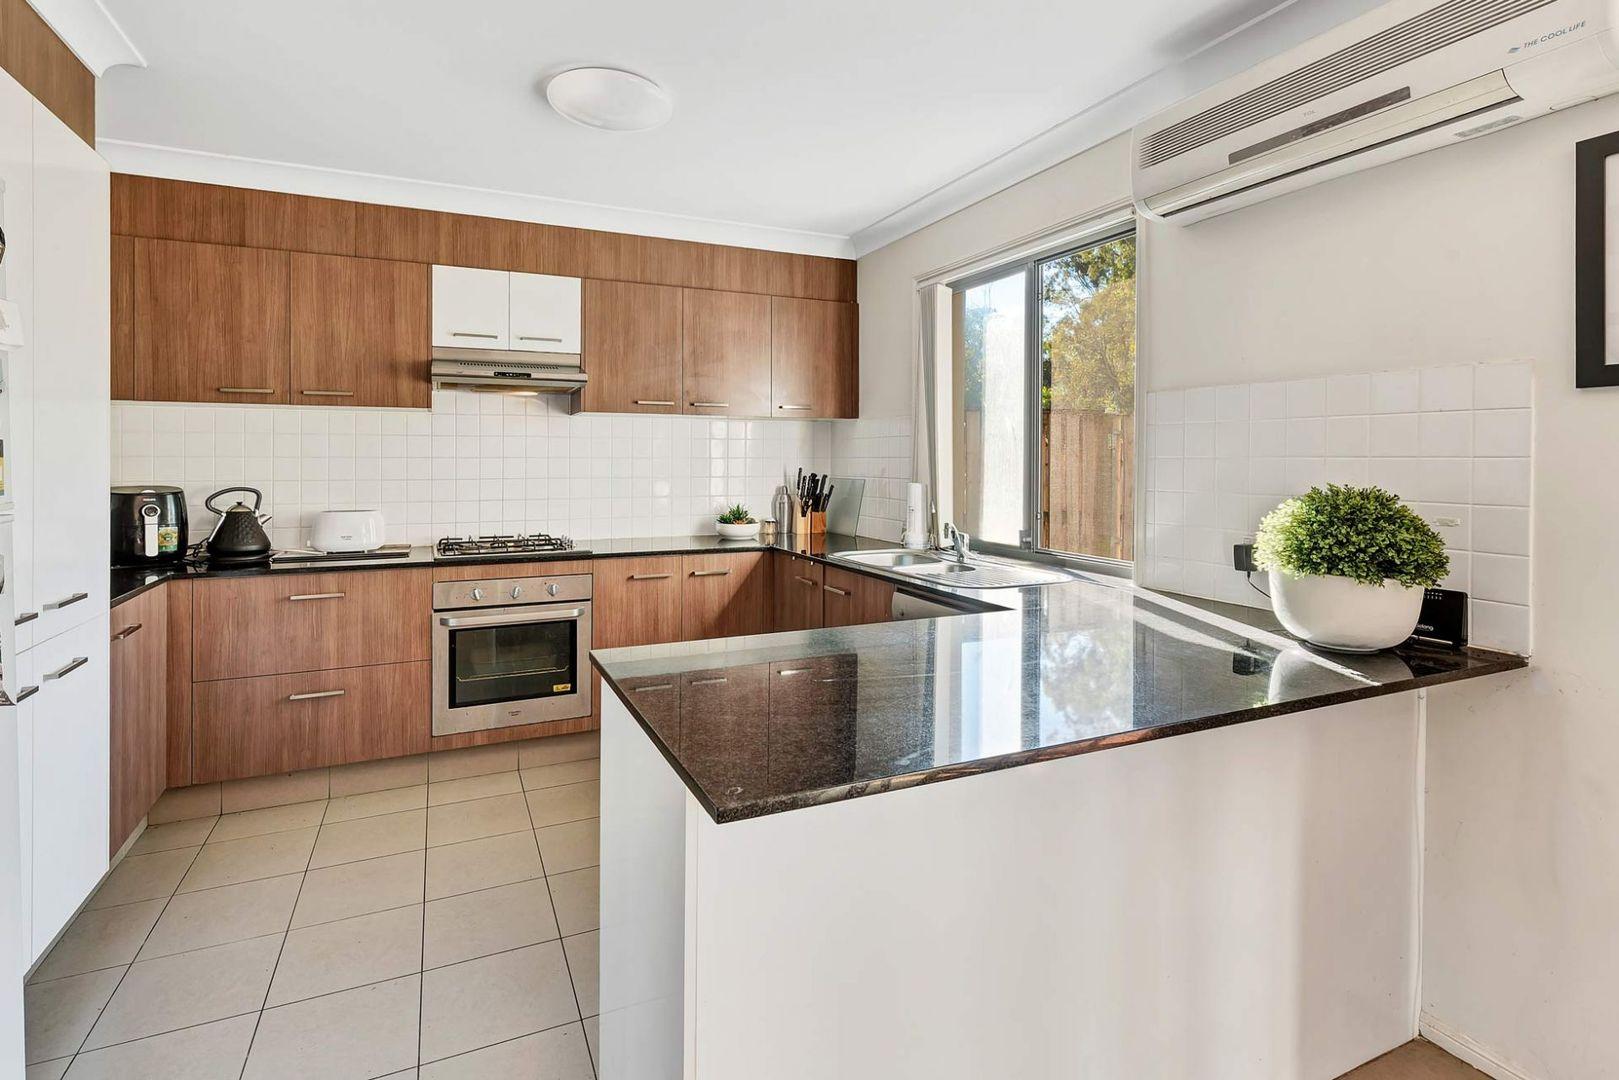 20/24 Jessica Drive, Upper Coomera QLD 4209, Image 1